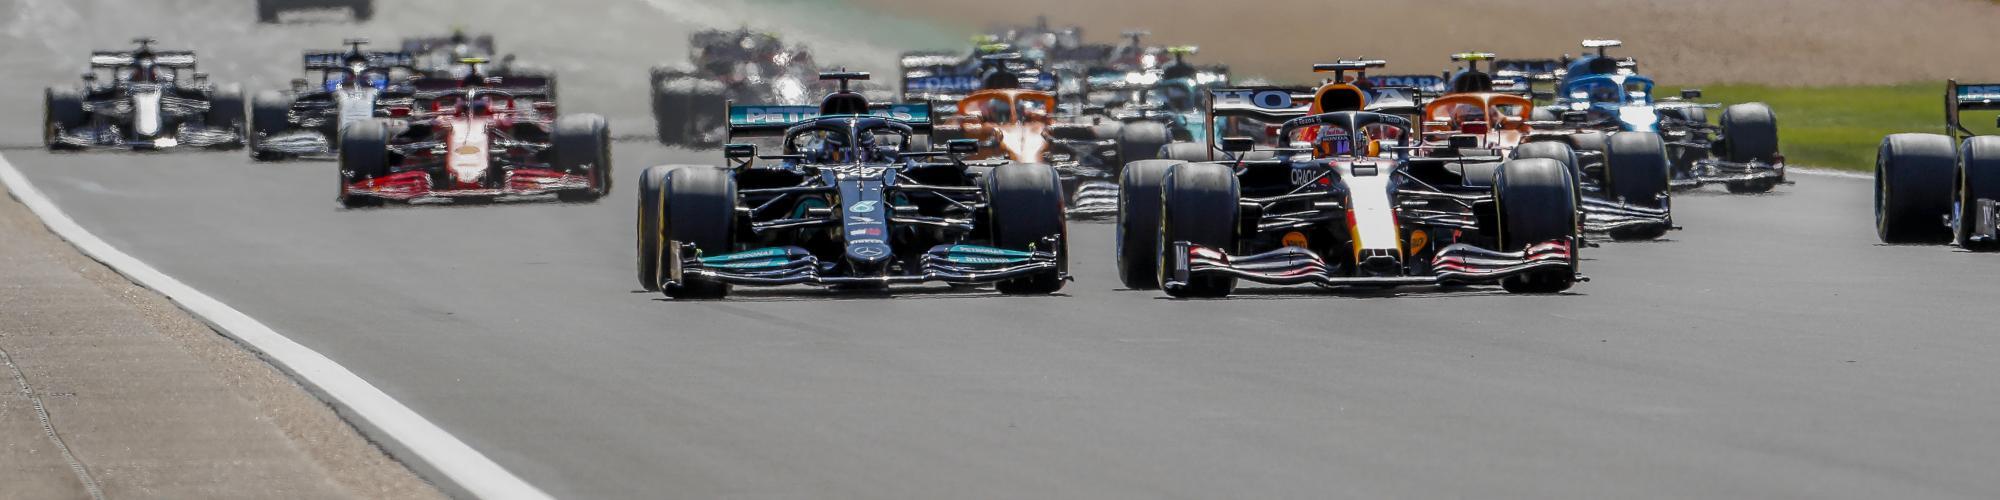 Leading Formula One Team cover image